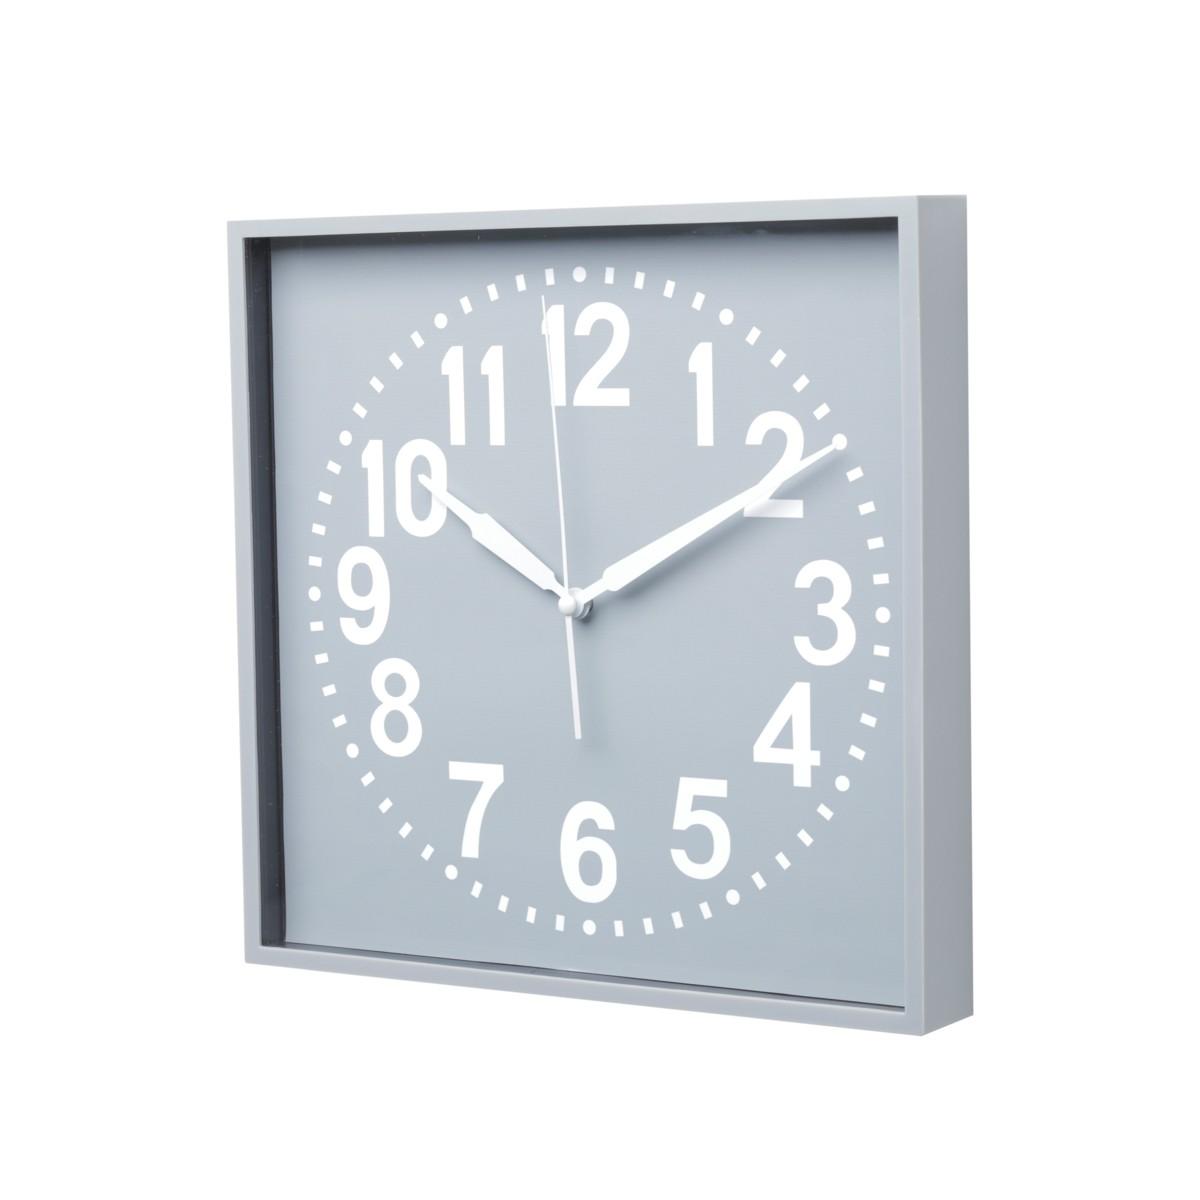 Relógio de Parede de Plástico Square Round Cinza e Branco  28,3 X 4,1 X 28,3 cm